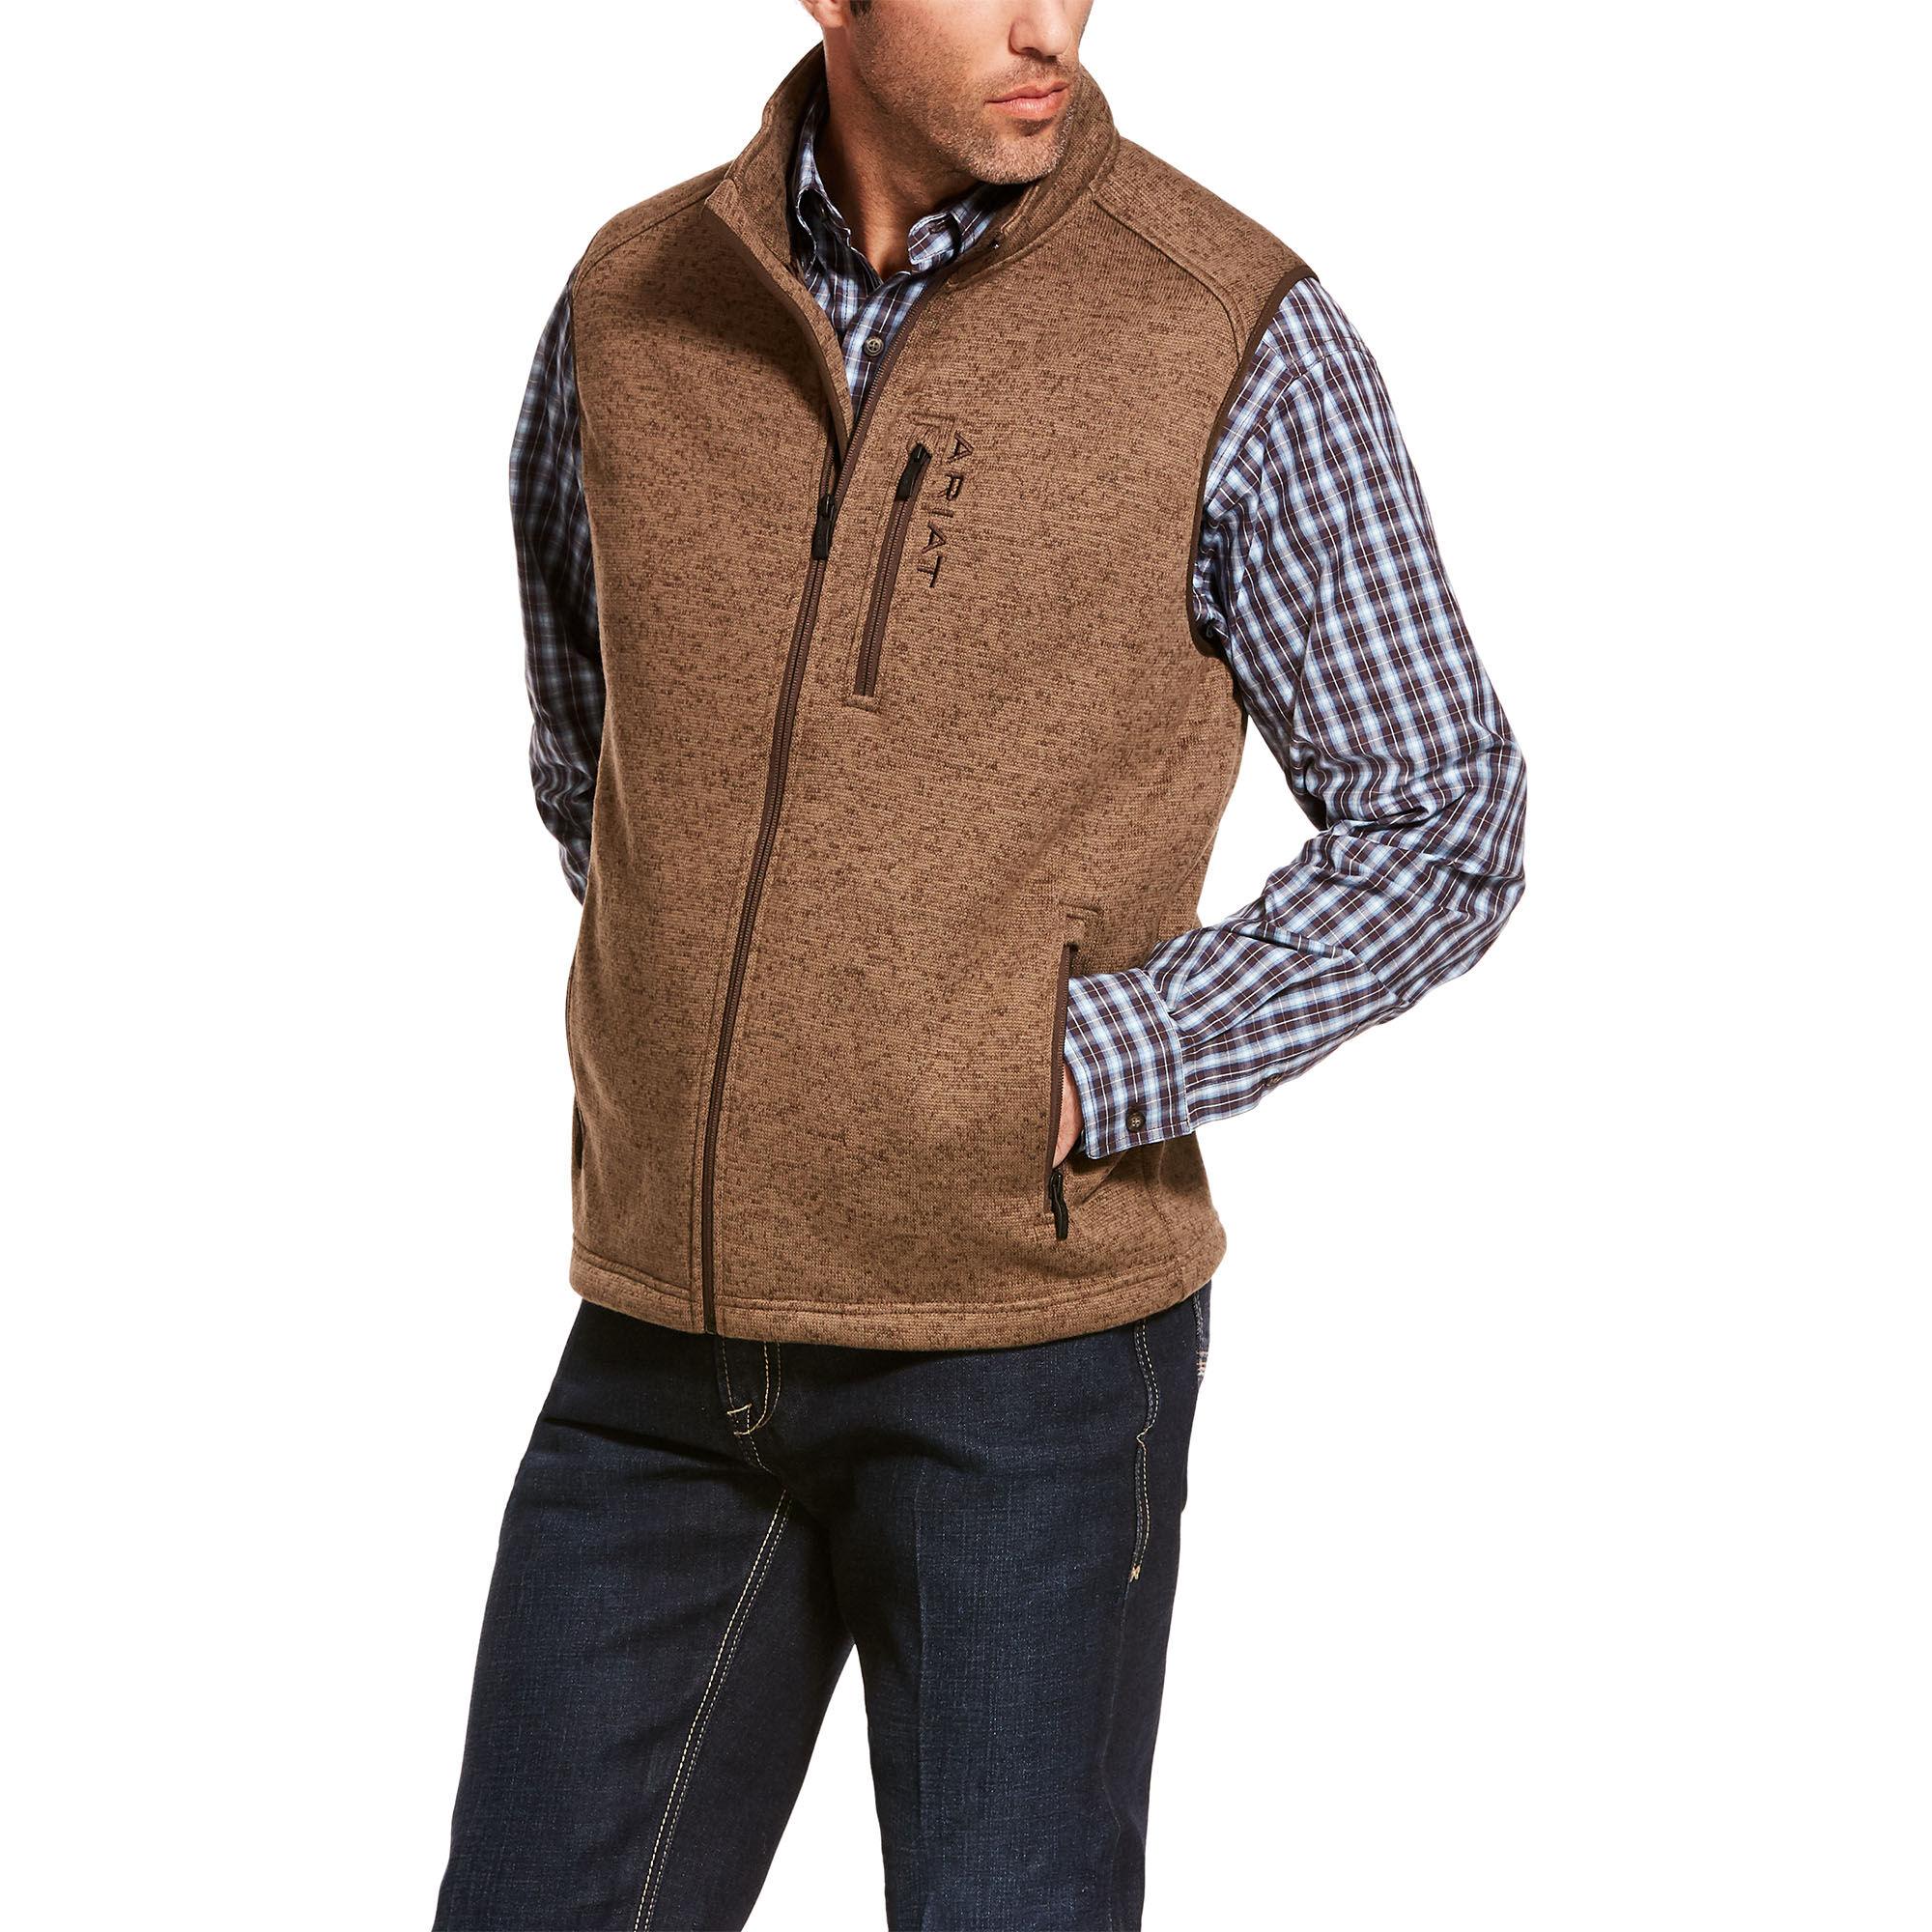 Caldwell Full Zip Vest